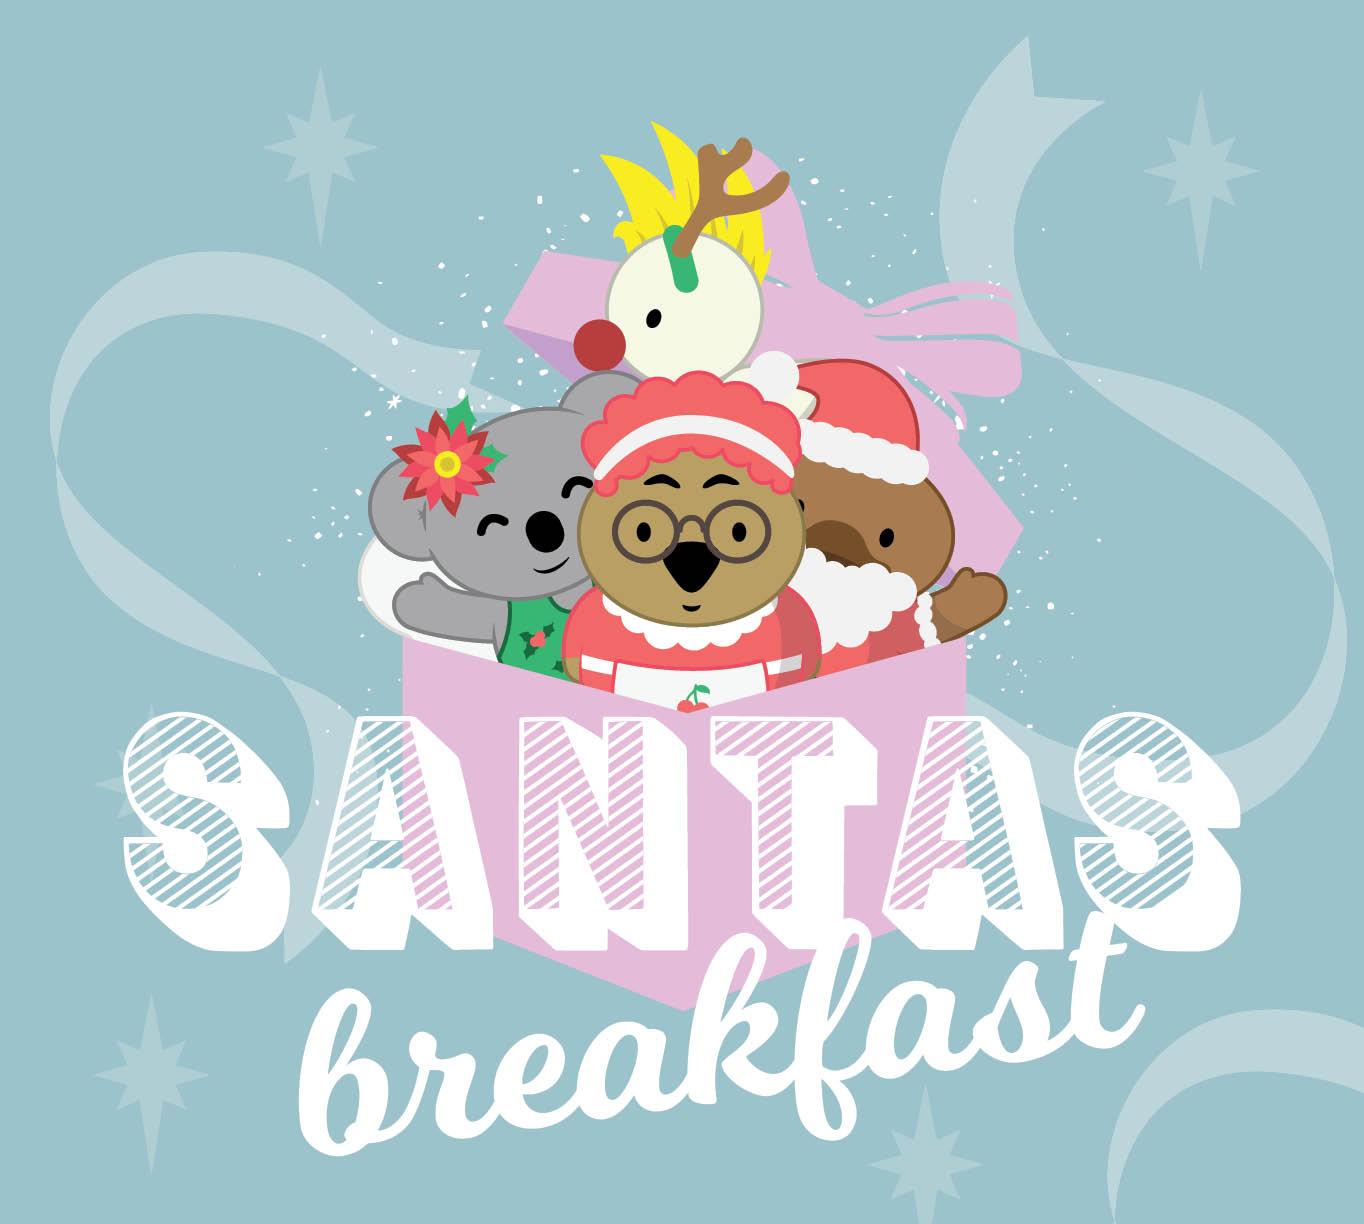 CH4962_CTM_Santas Breakfast_Web Tiles_628x612px